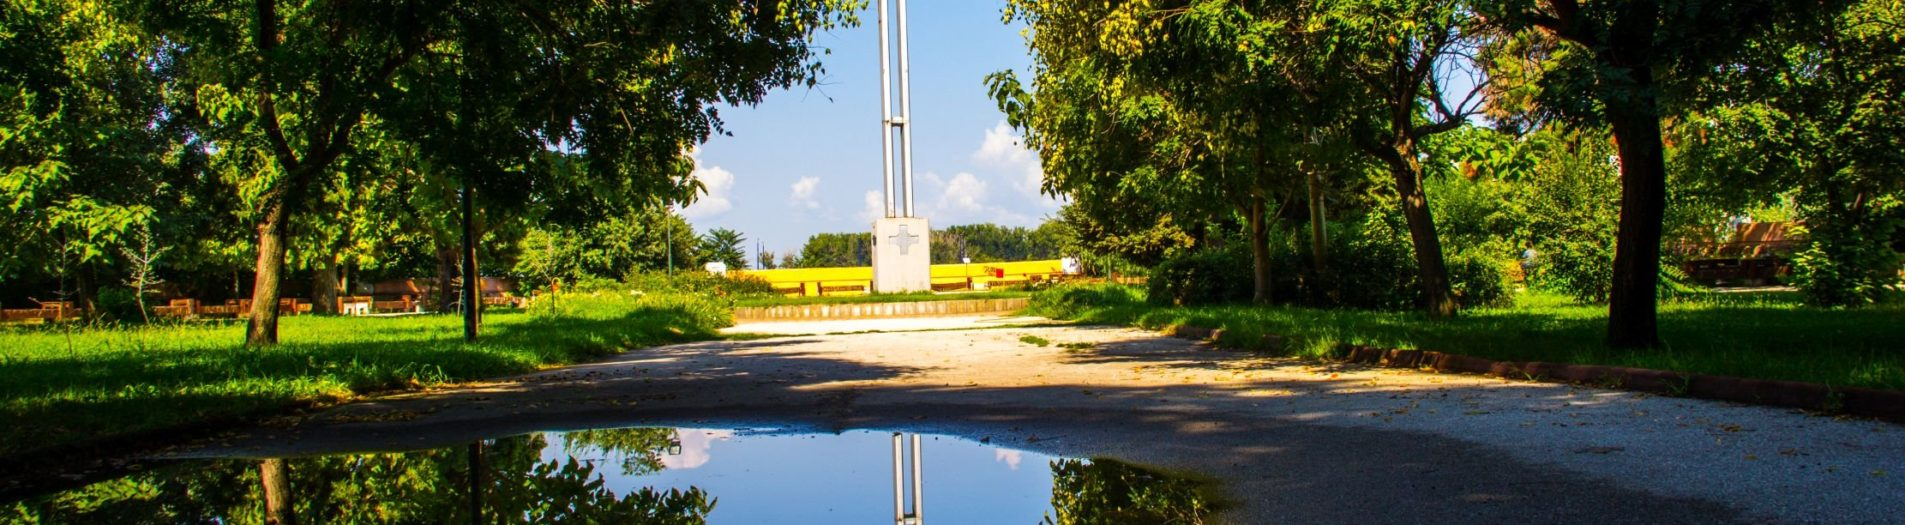 Парк Острова - Сбовода - град Пазарджик